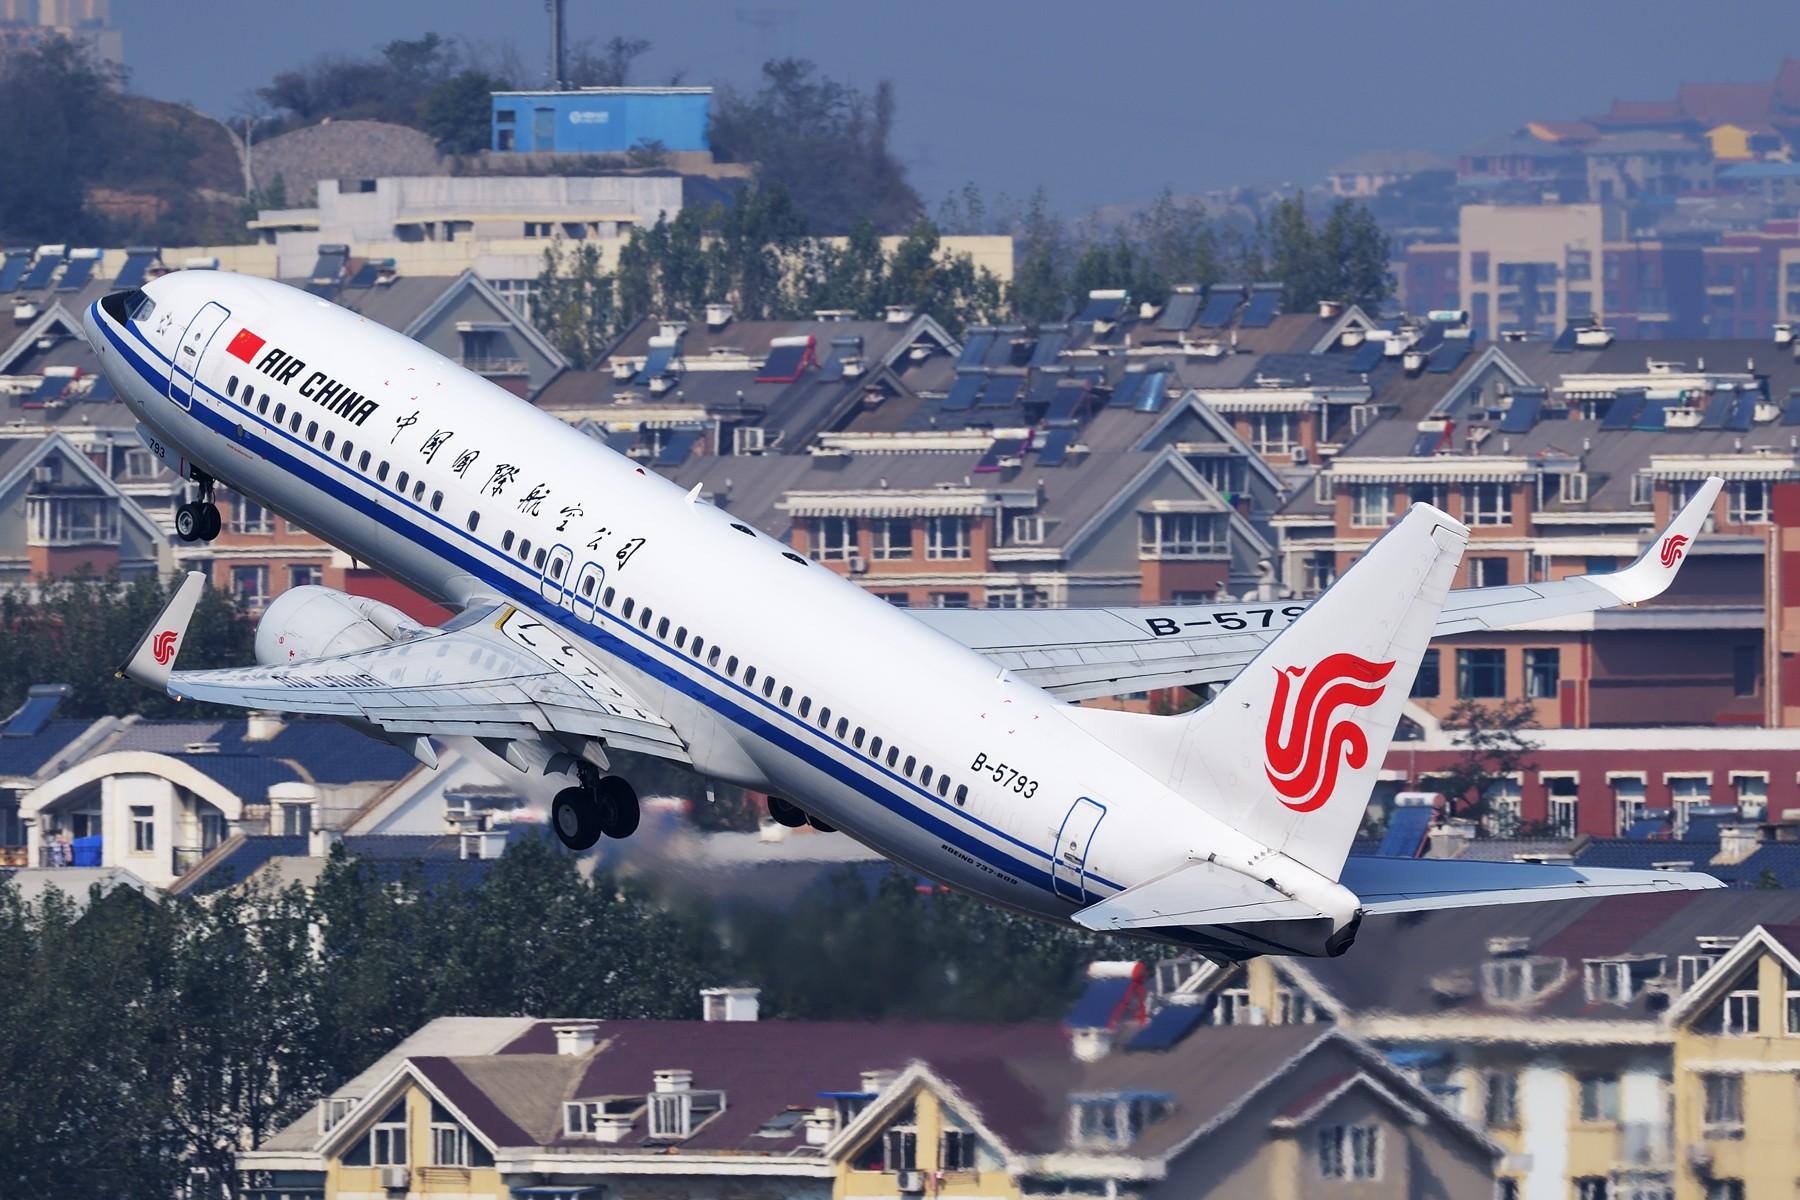 Re:[原创]★[DLC]2016年终总结(持续更新中)★ BOEING 737-800 B-5793 中国大连国际机场